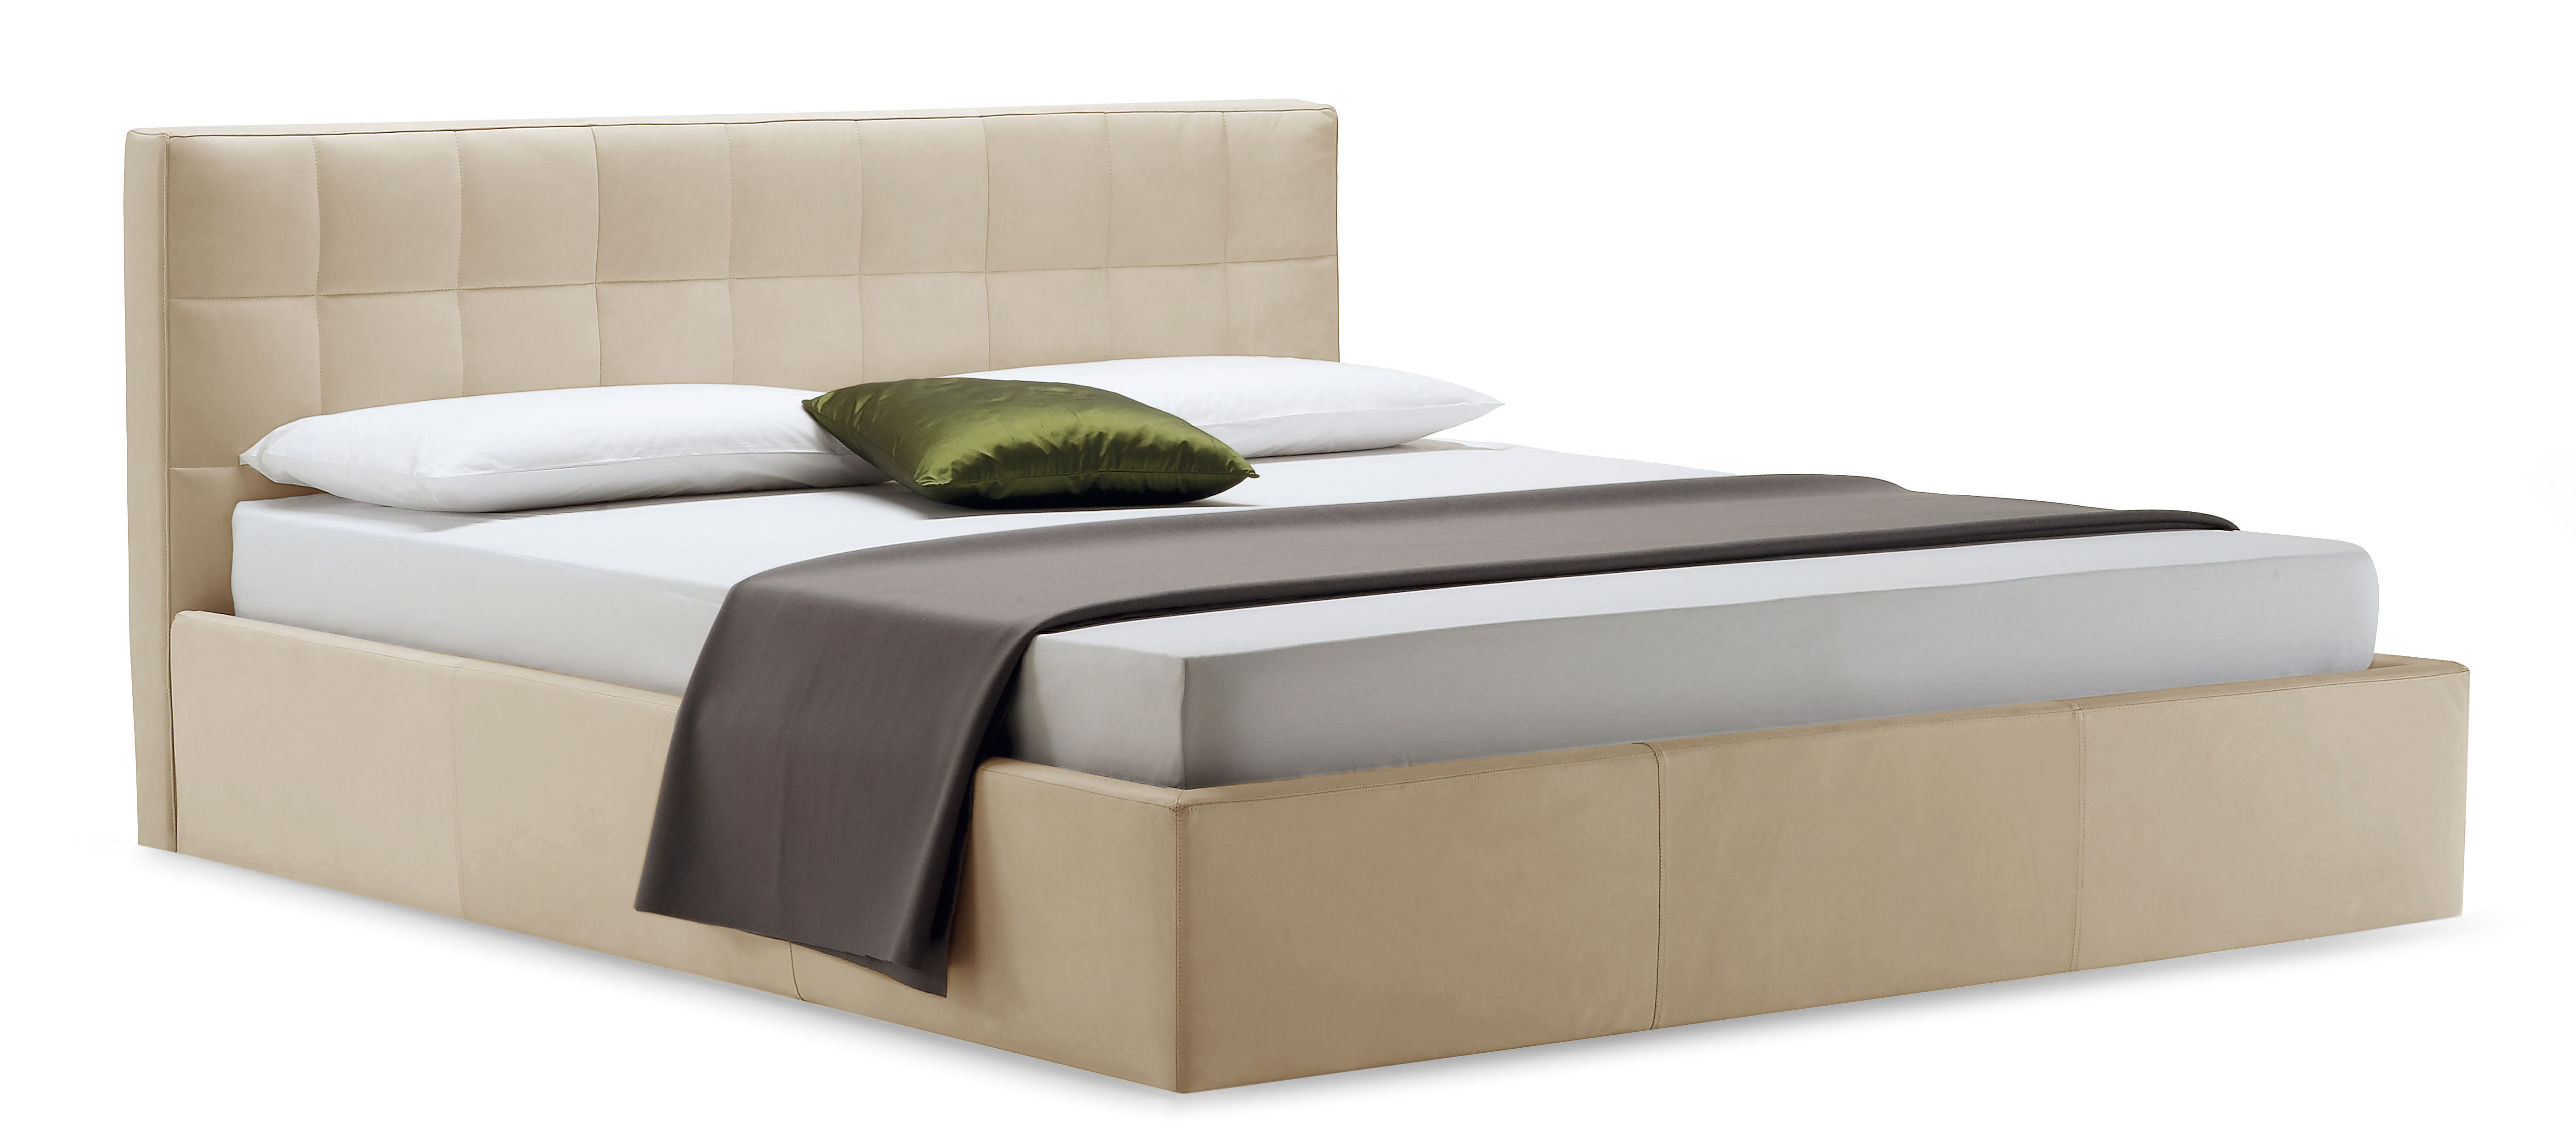 lit double box 171 x 218 cm tissu beige chin zanotta. Black Bedroom Furniture Sets. Home Design Ideas